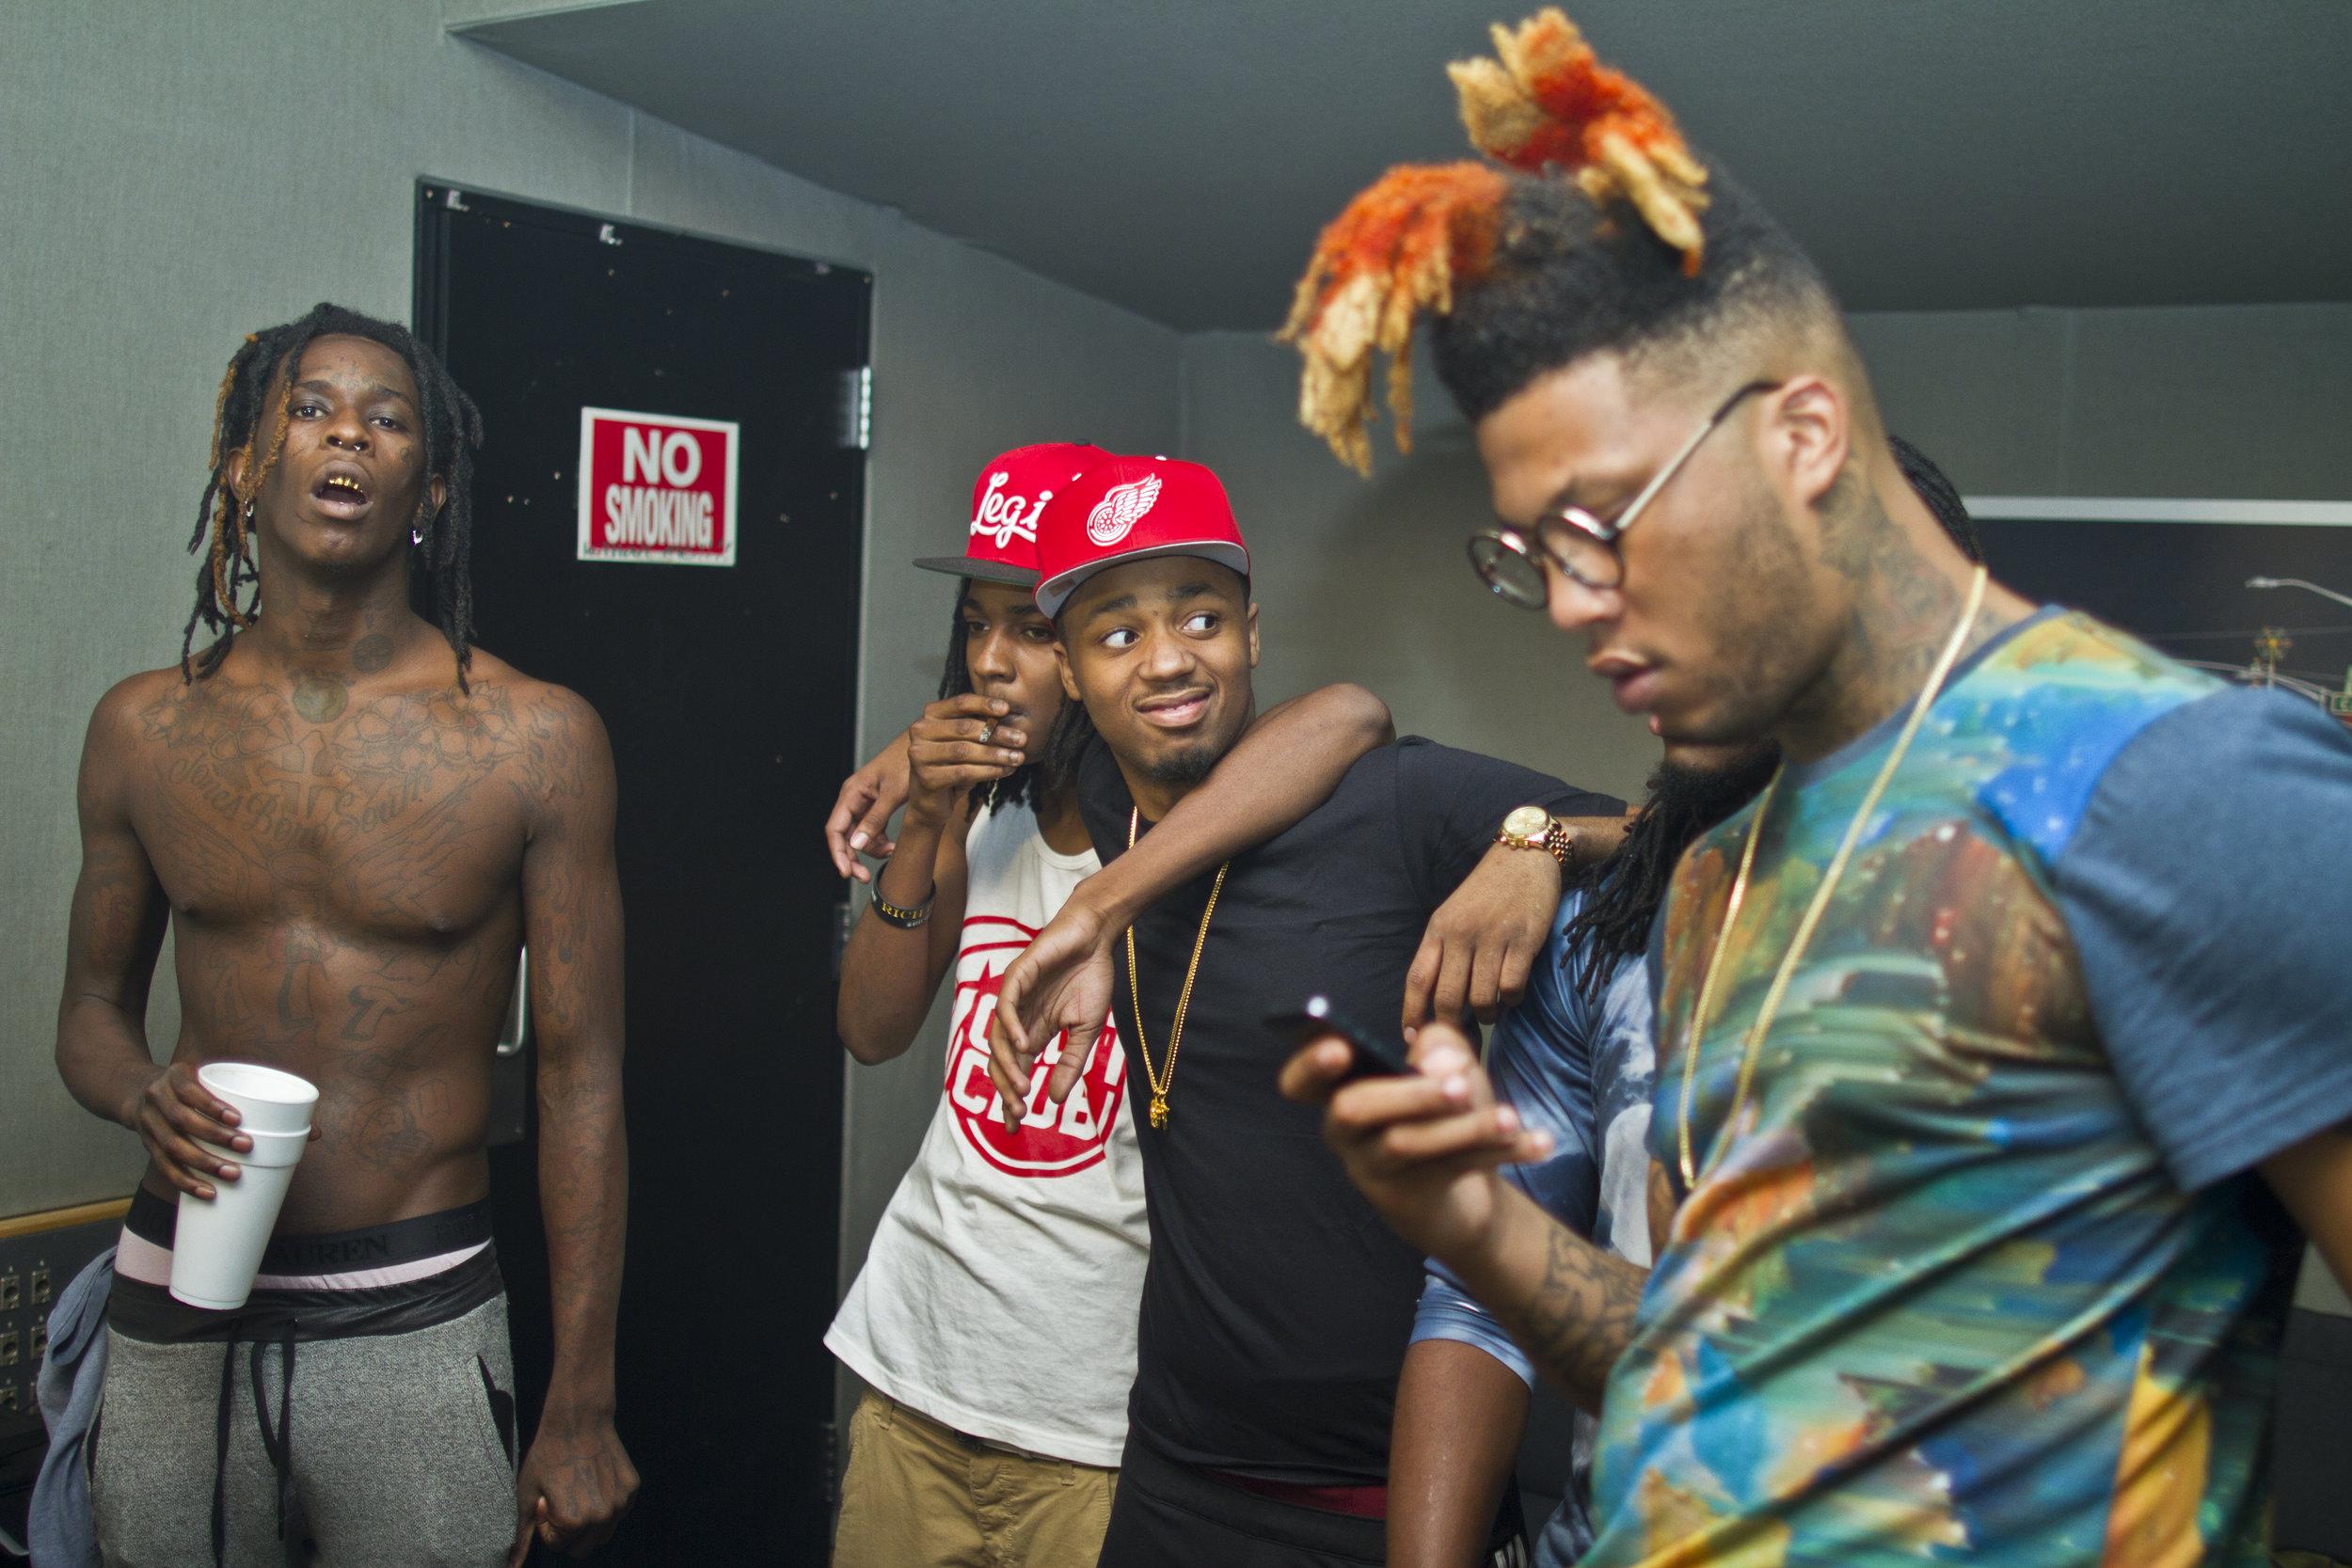 Young Thug, DJ Lil Keem, Metro Boomin, TM88, Atlanta, GA 2013